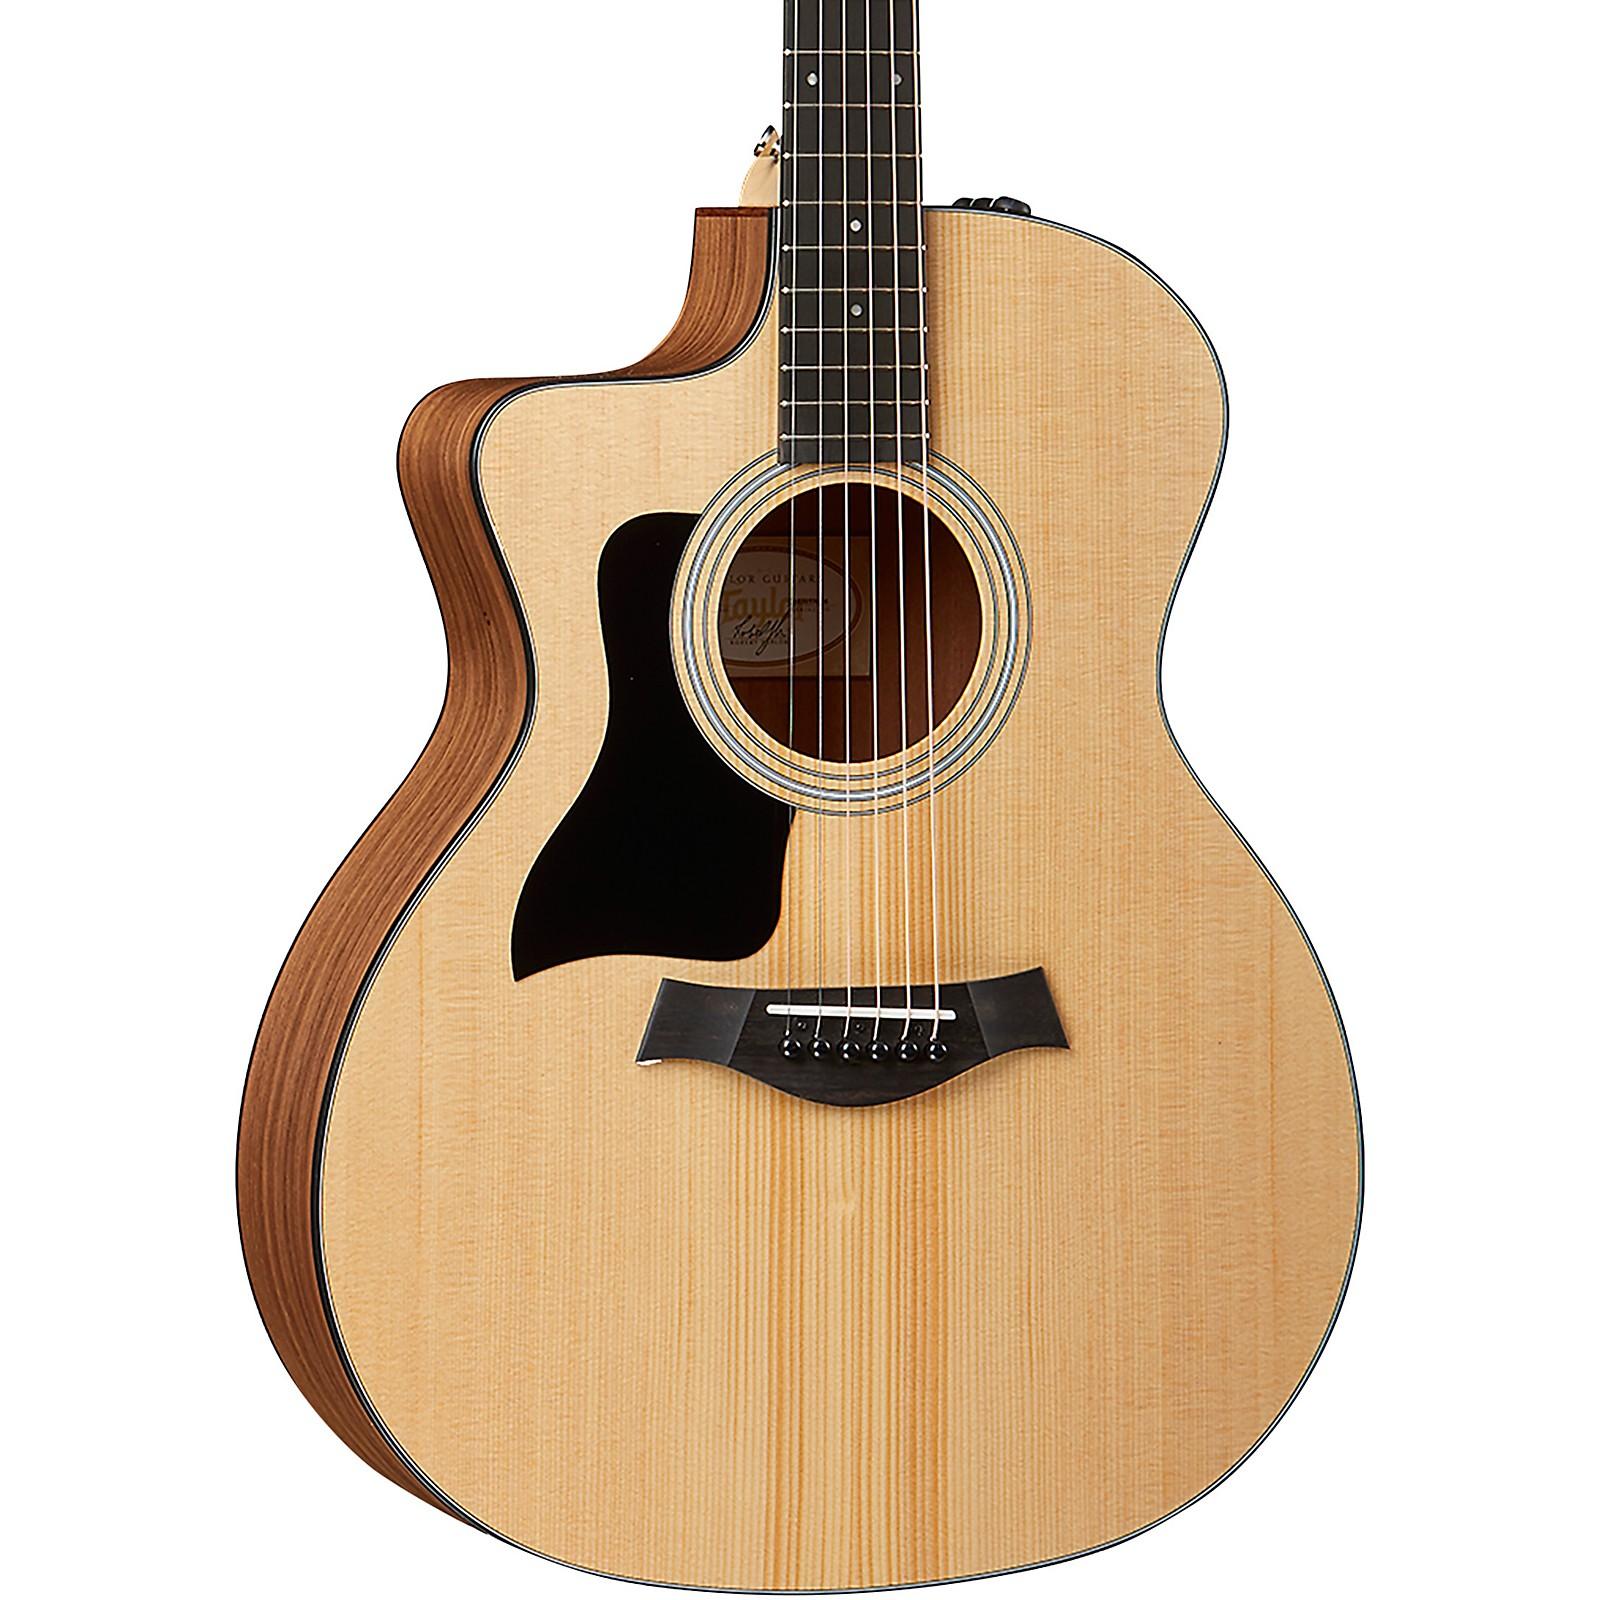 Taylor 114ce-LH Left-Handed Grand Auditorium Acoustic-Electric Guitar